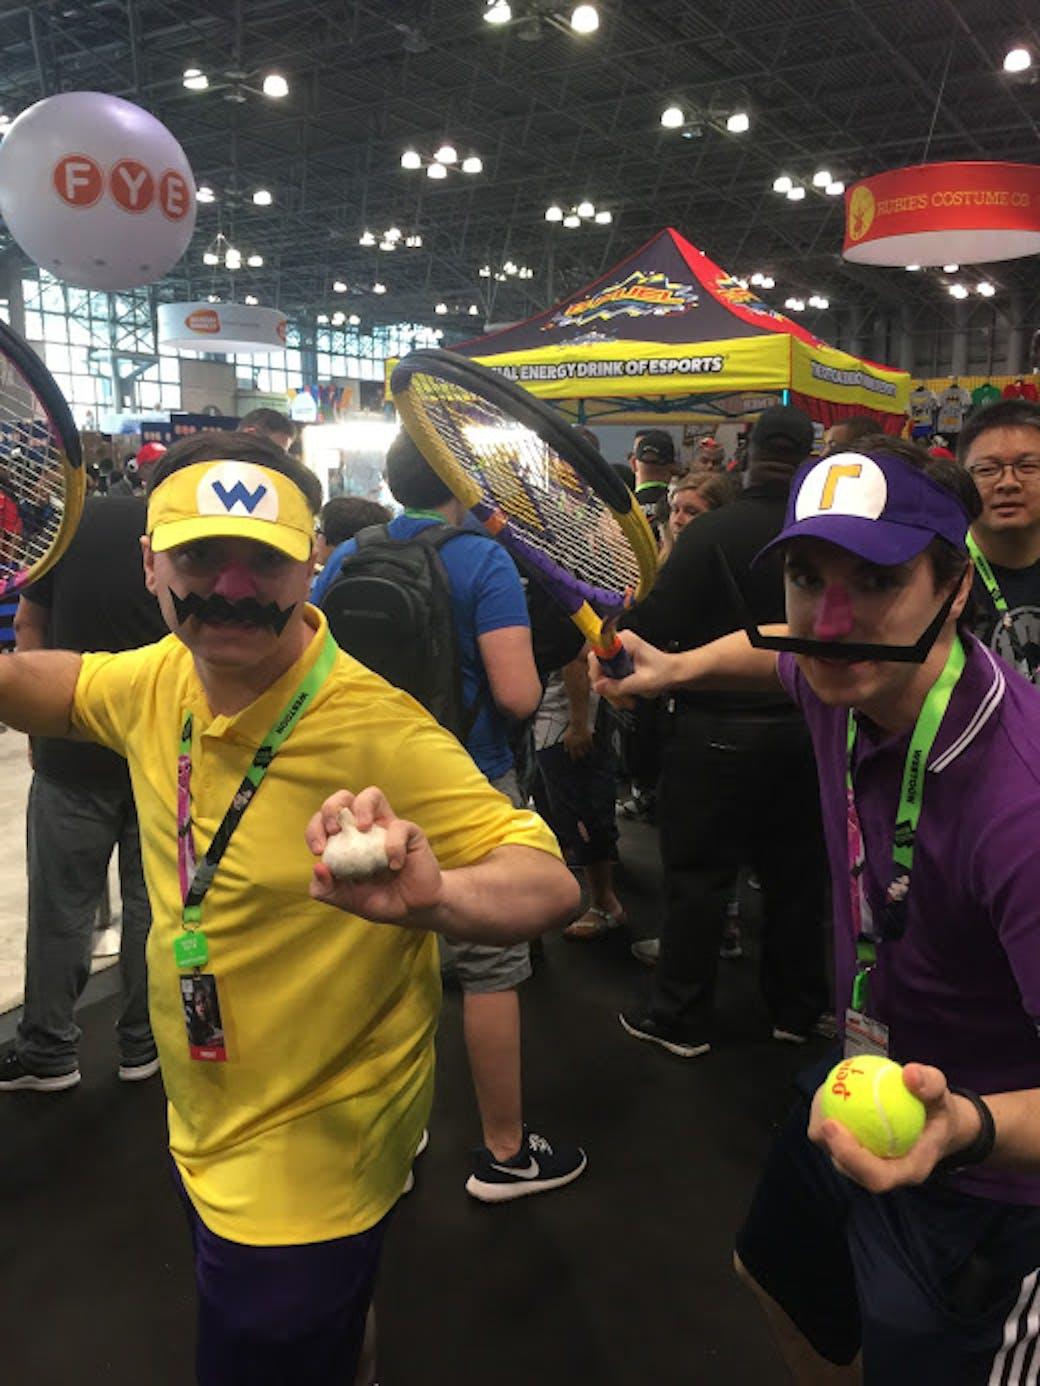 Waluigi and Wario in their Mario Tennis best